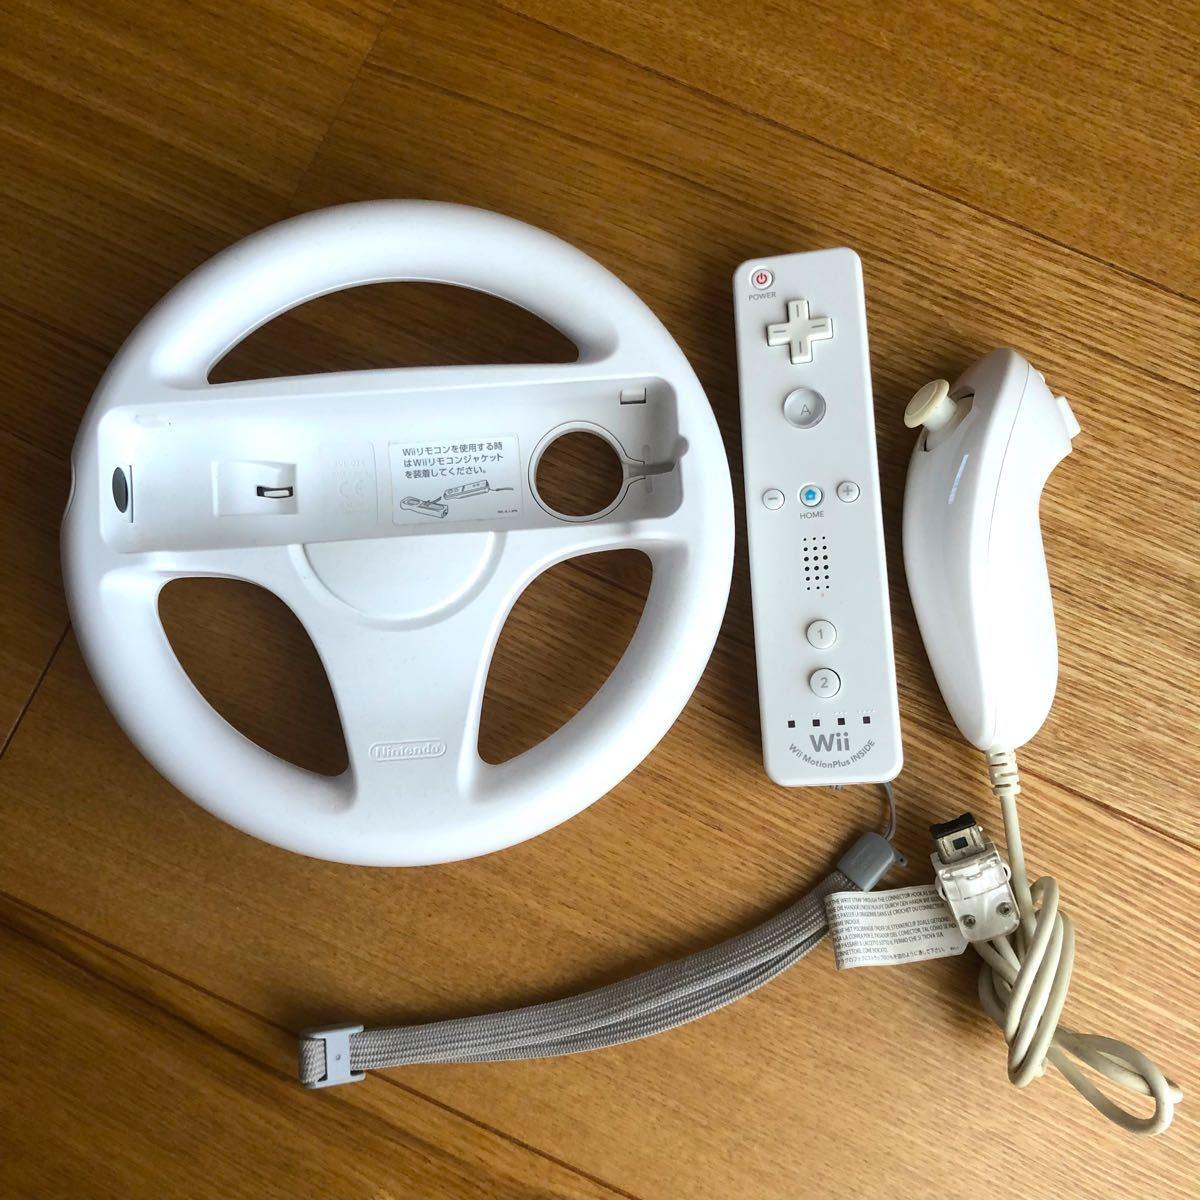 WiiU Nintendo マリオカート8 シロ 付属品 ソフト Wii マリオカート 任天堂Wii ニンテンドー